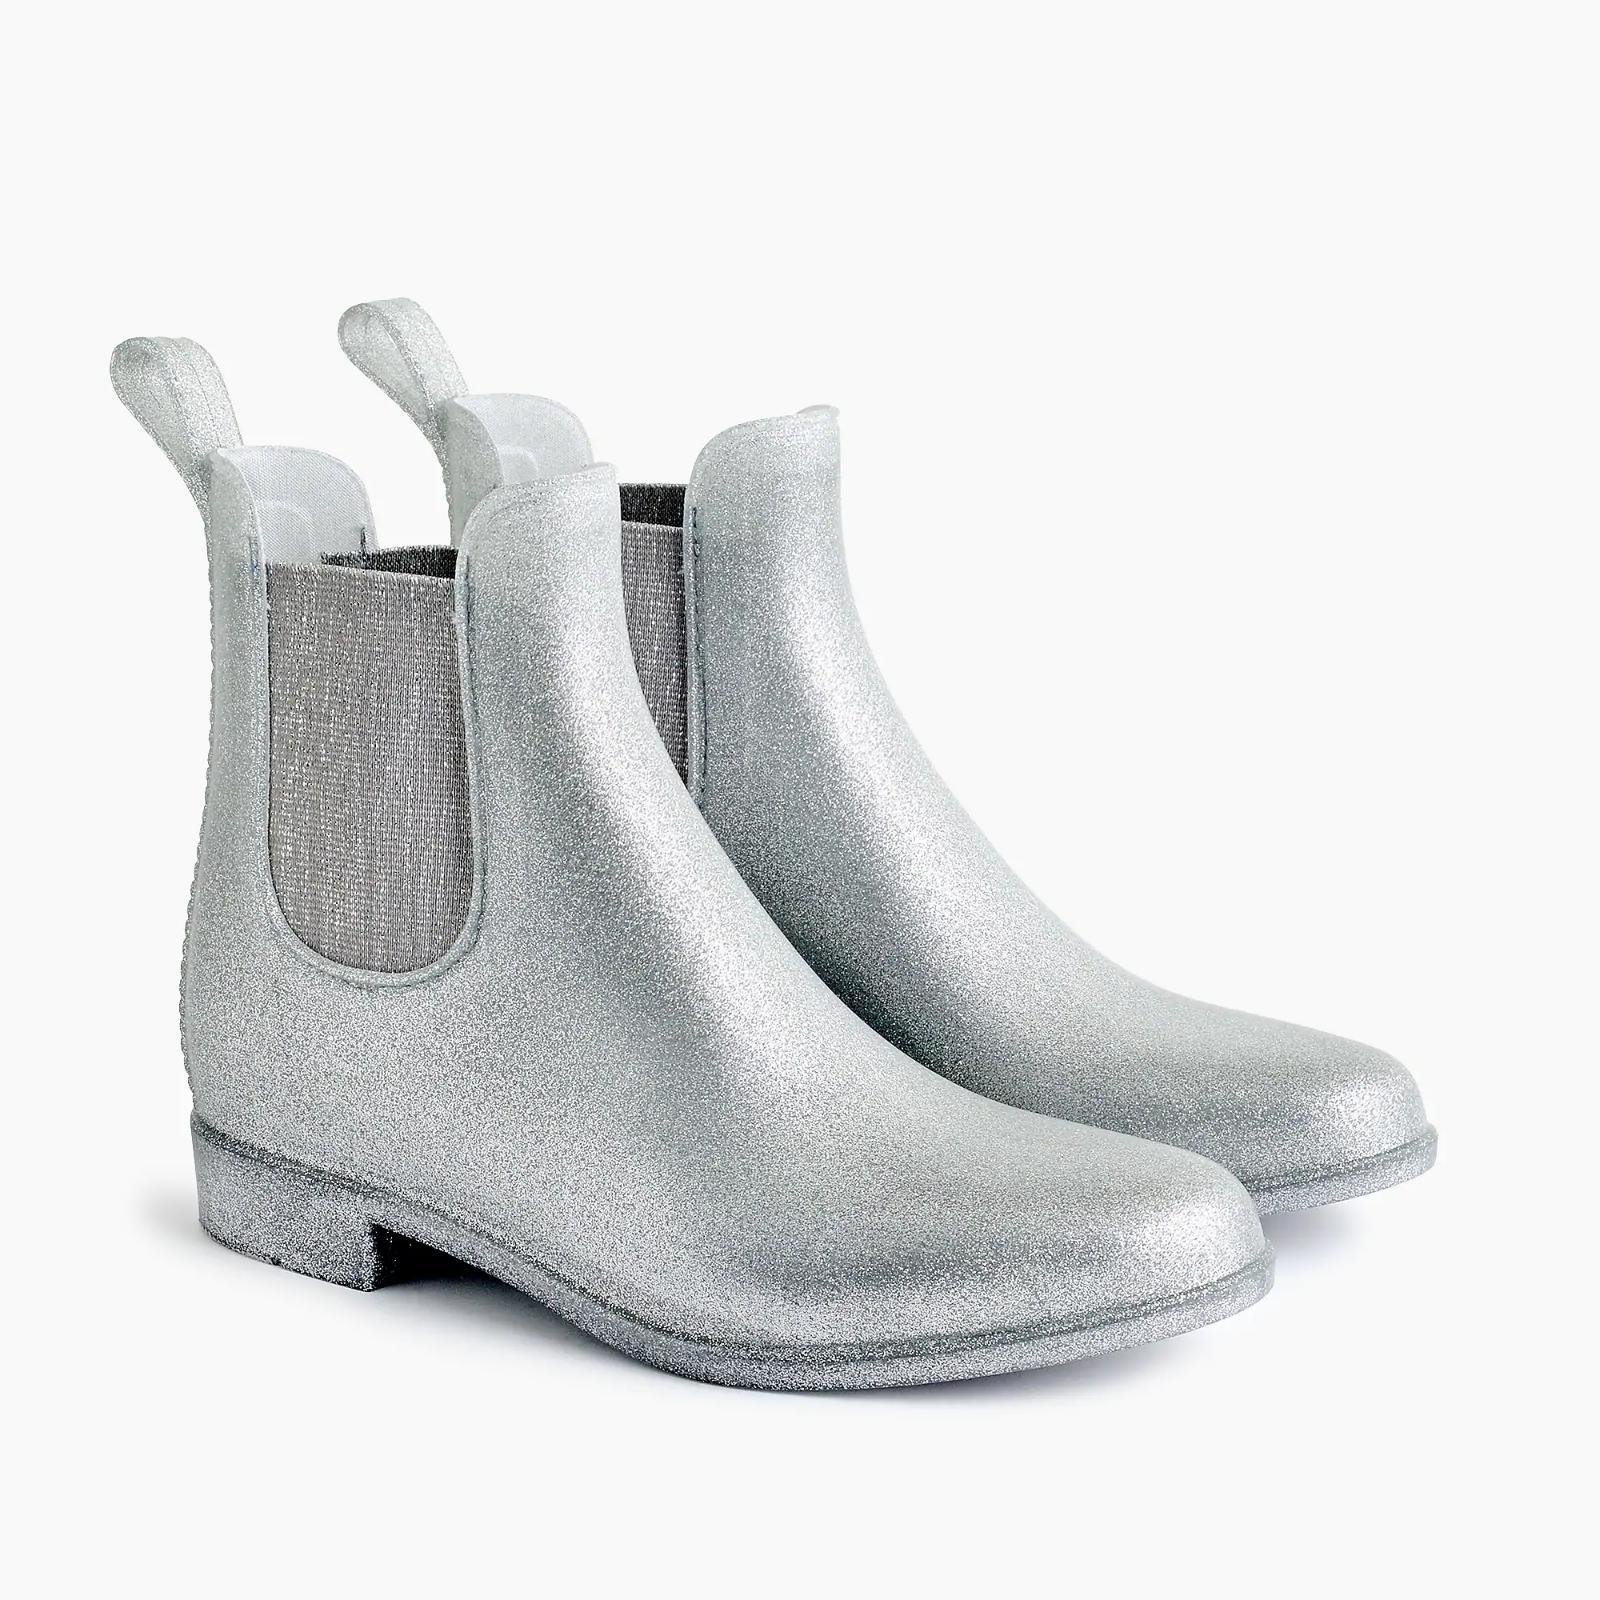 J. Crew Women's New in Box Glitter Chelsea Rain Boots - Glitter SIlver - Size 8